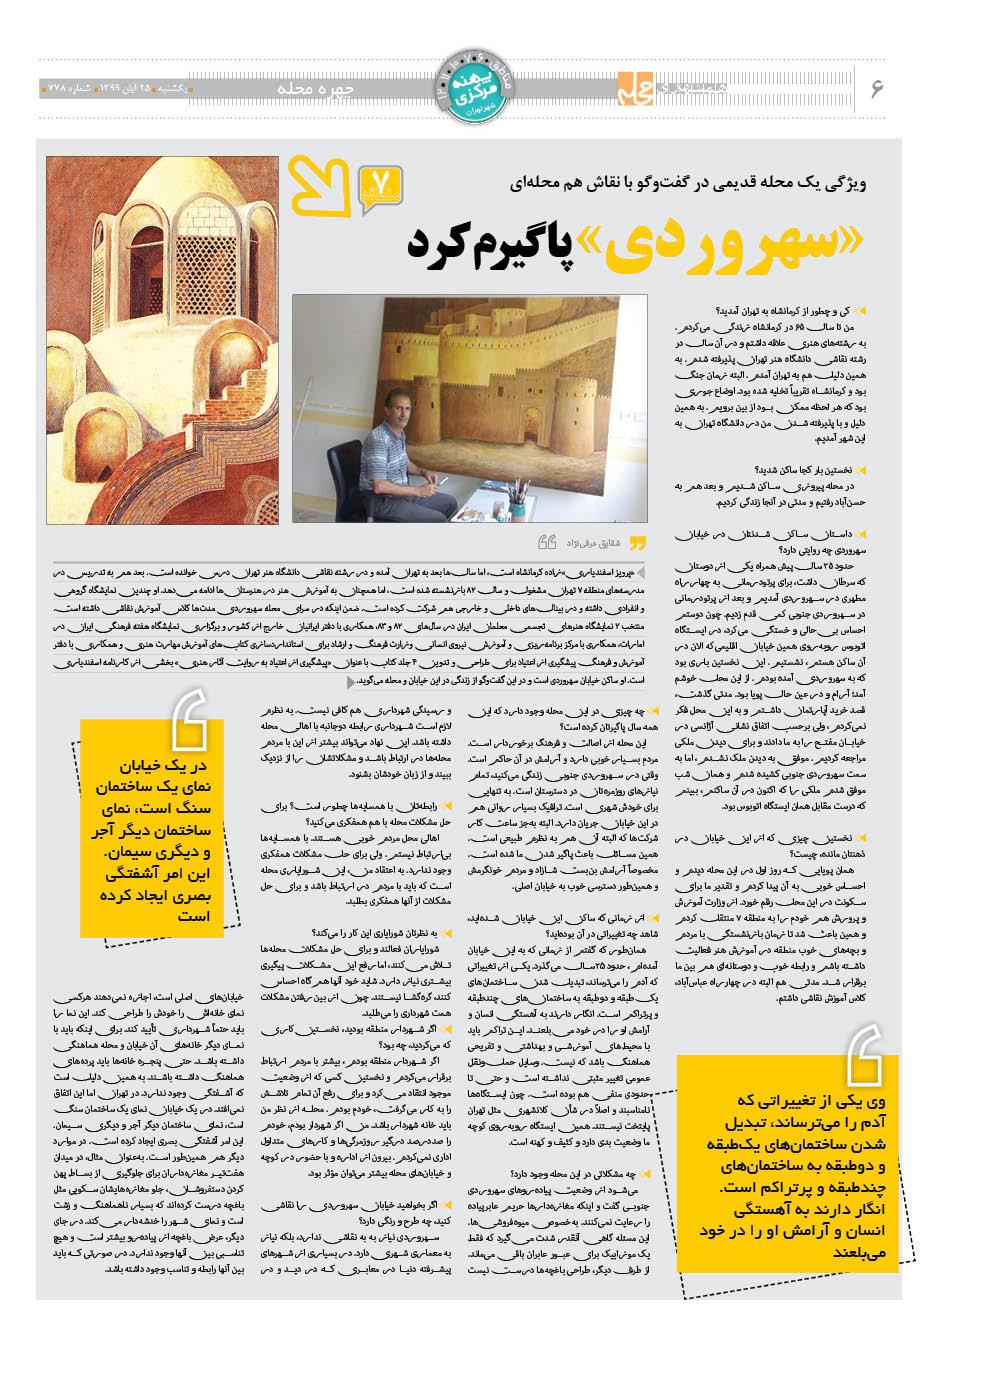 صفحه 6 محله